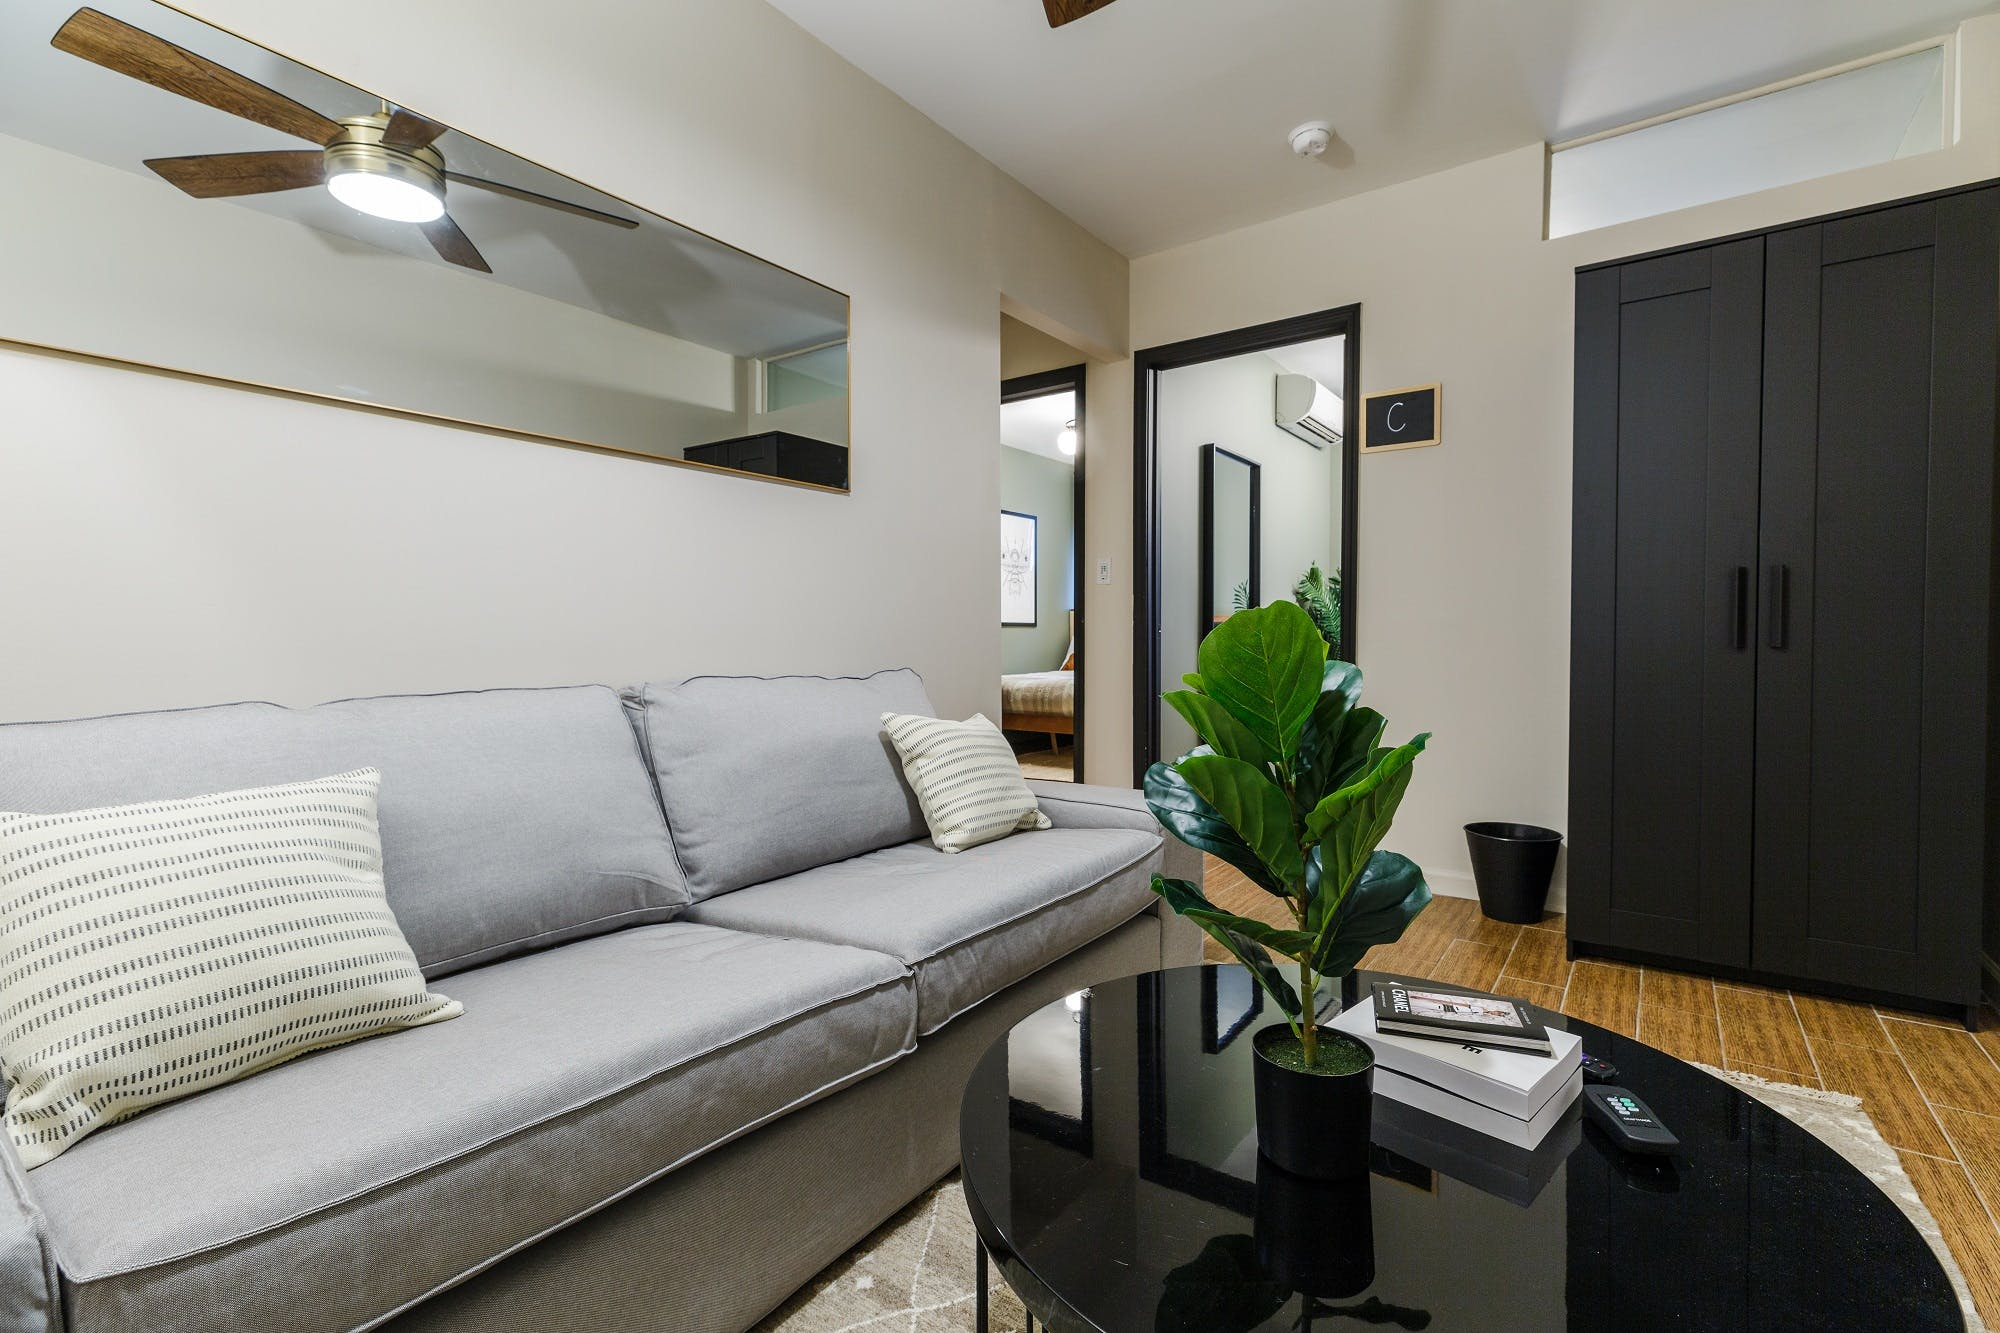 6 Residents | Eldridge St. - Chinatown | Comfortable Bright Apt.